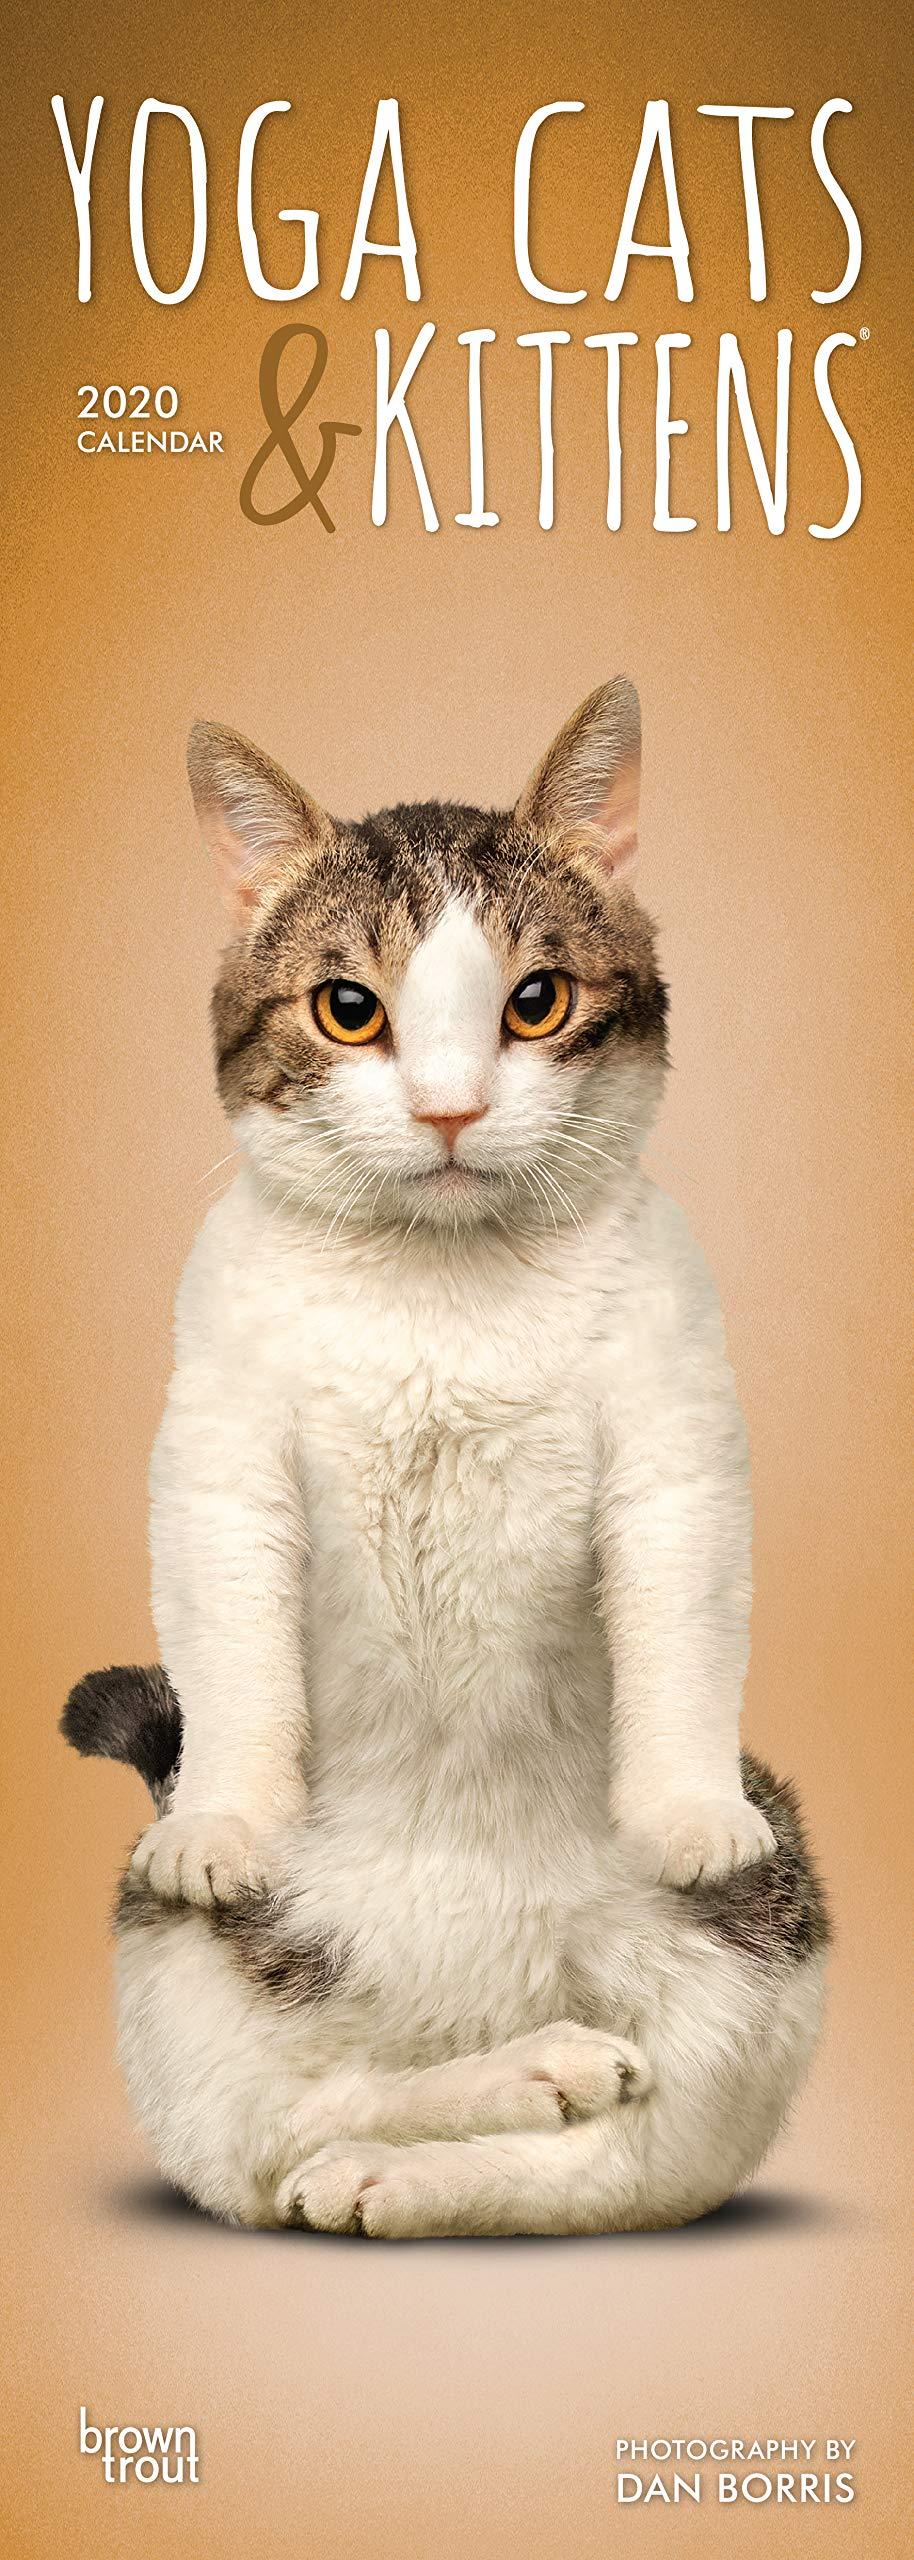 Yoga Cats & Kittens 2020 Slimline-Kalender: Original ...